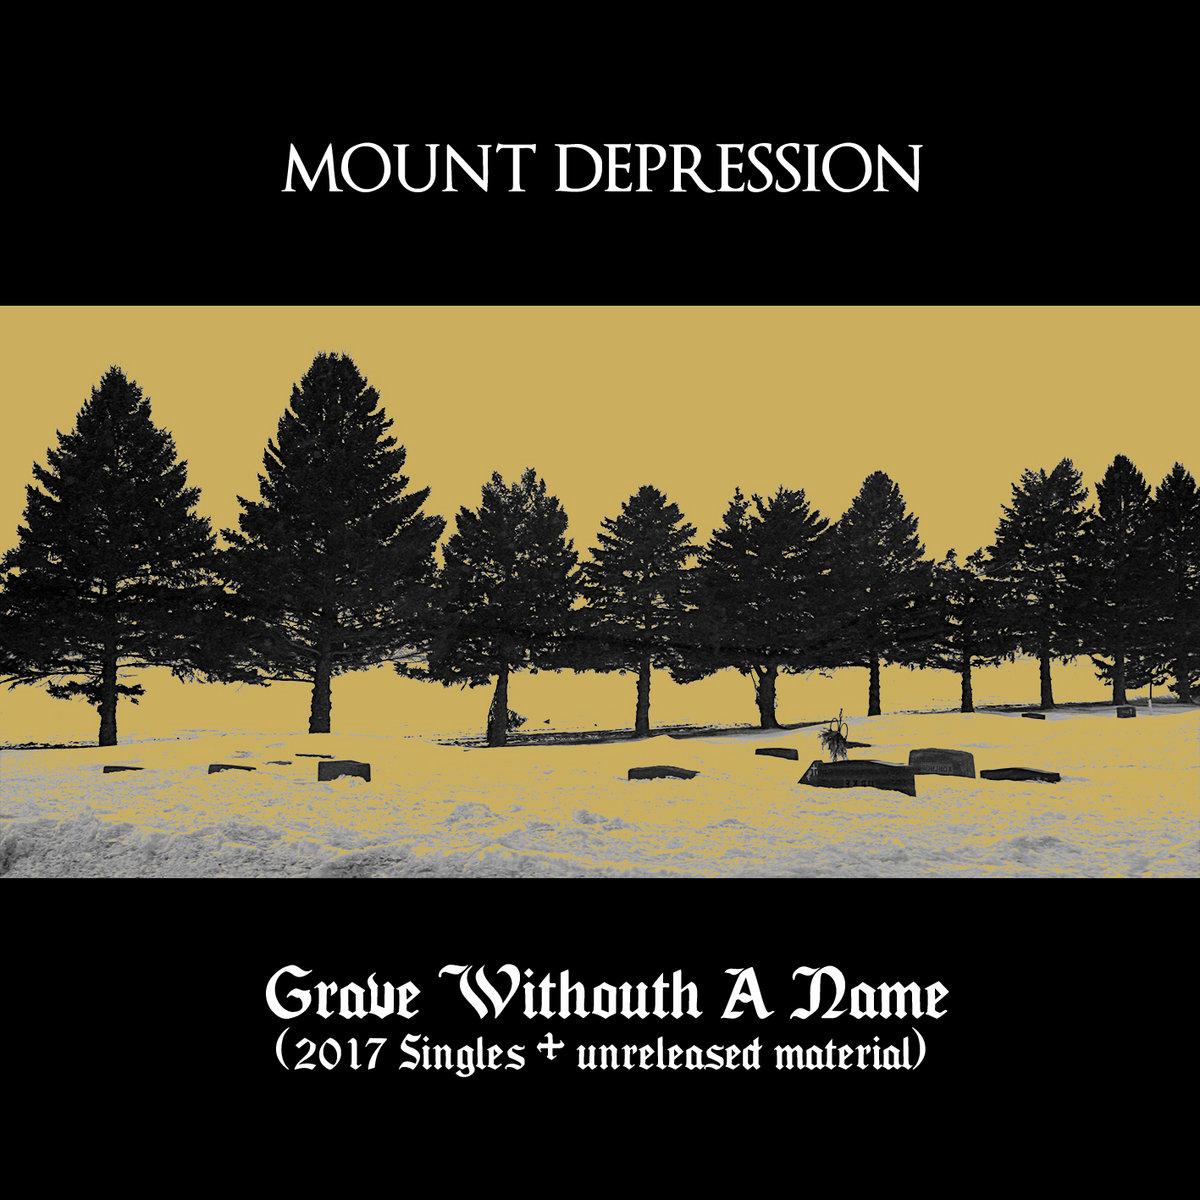 grave depression